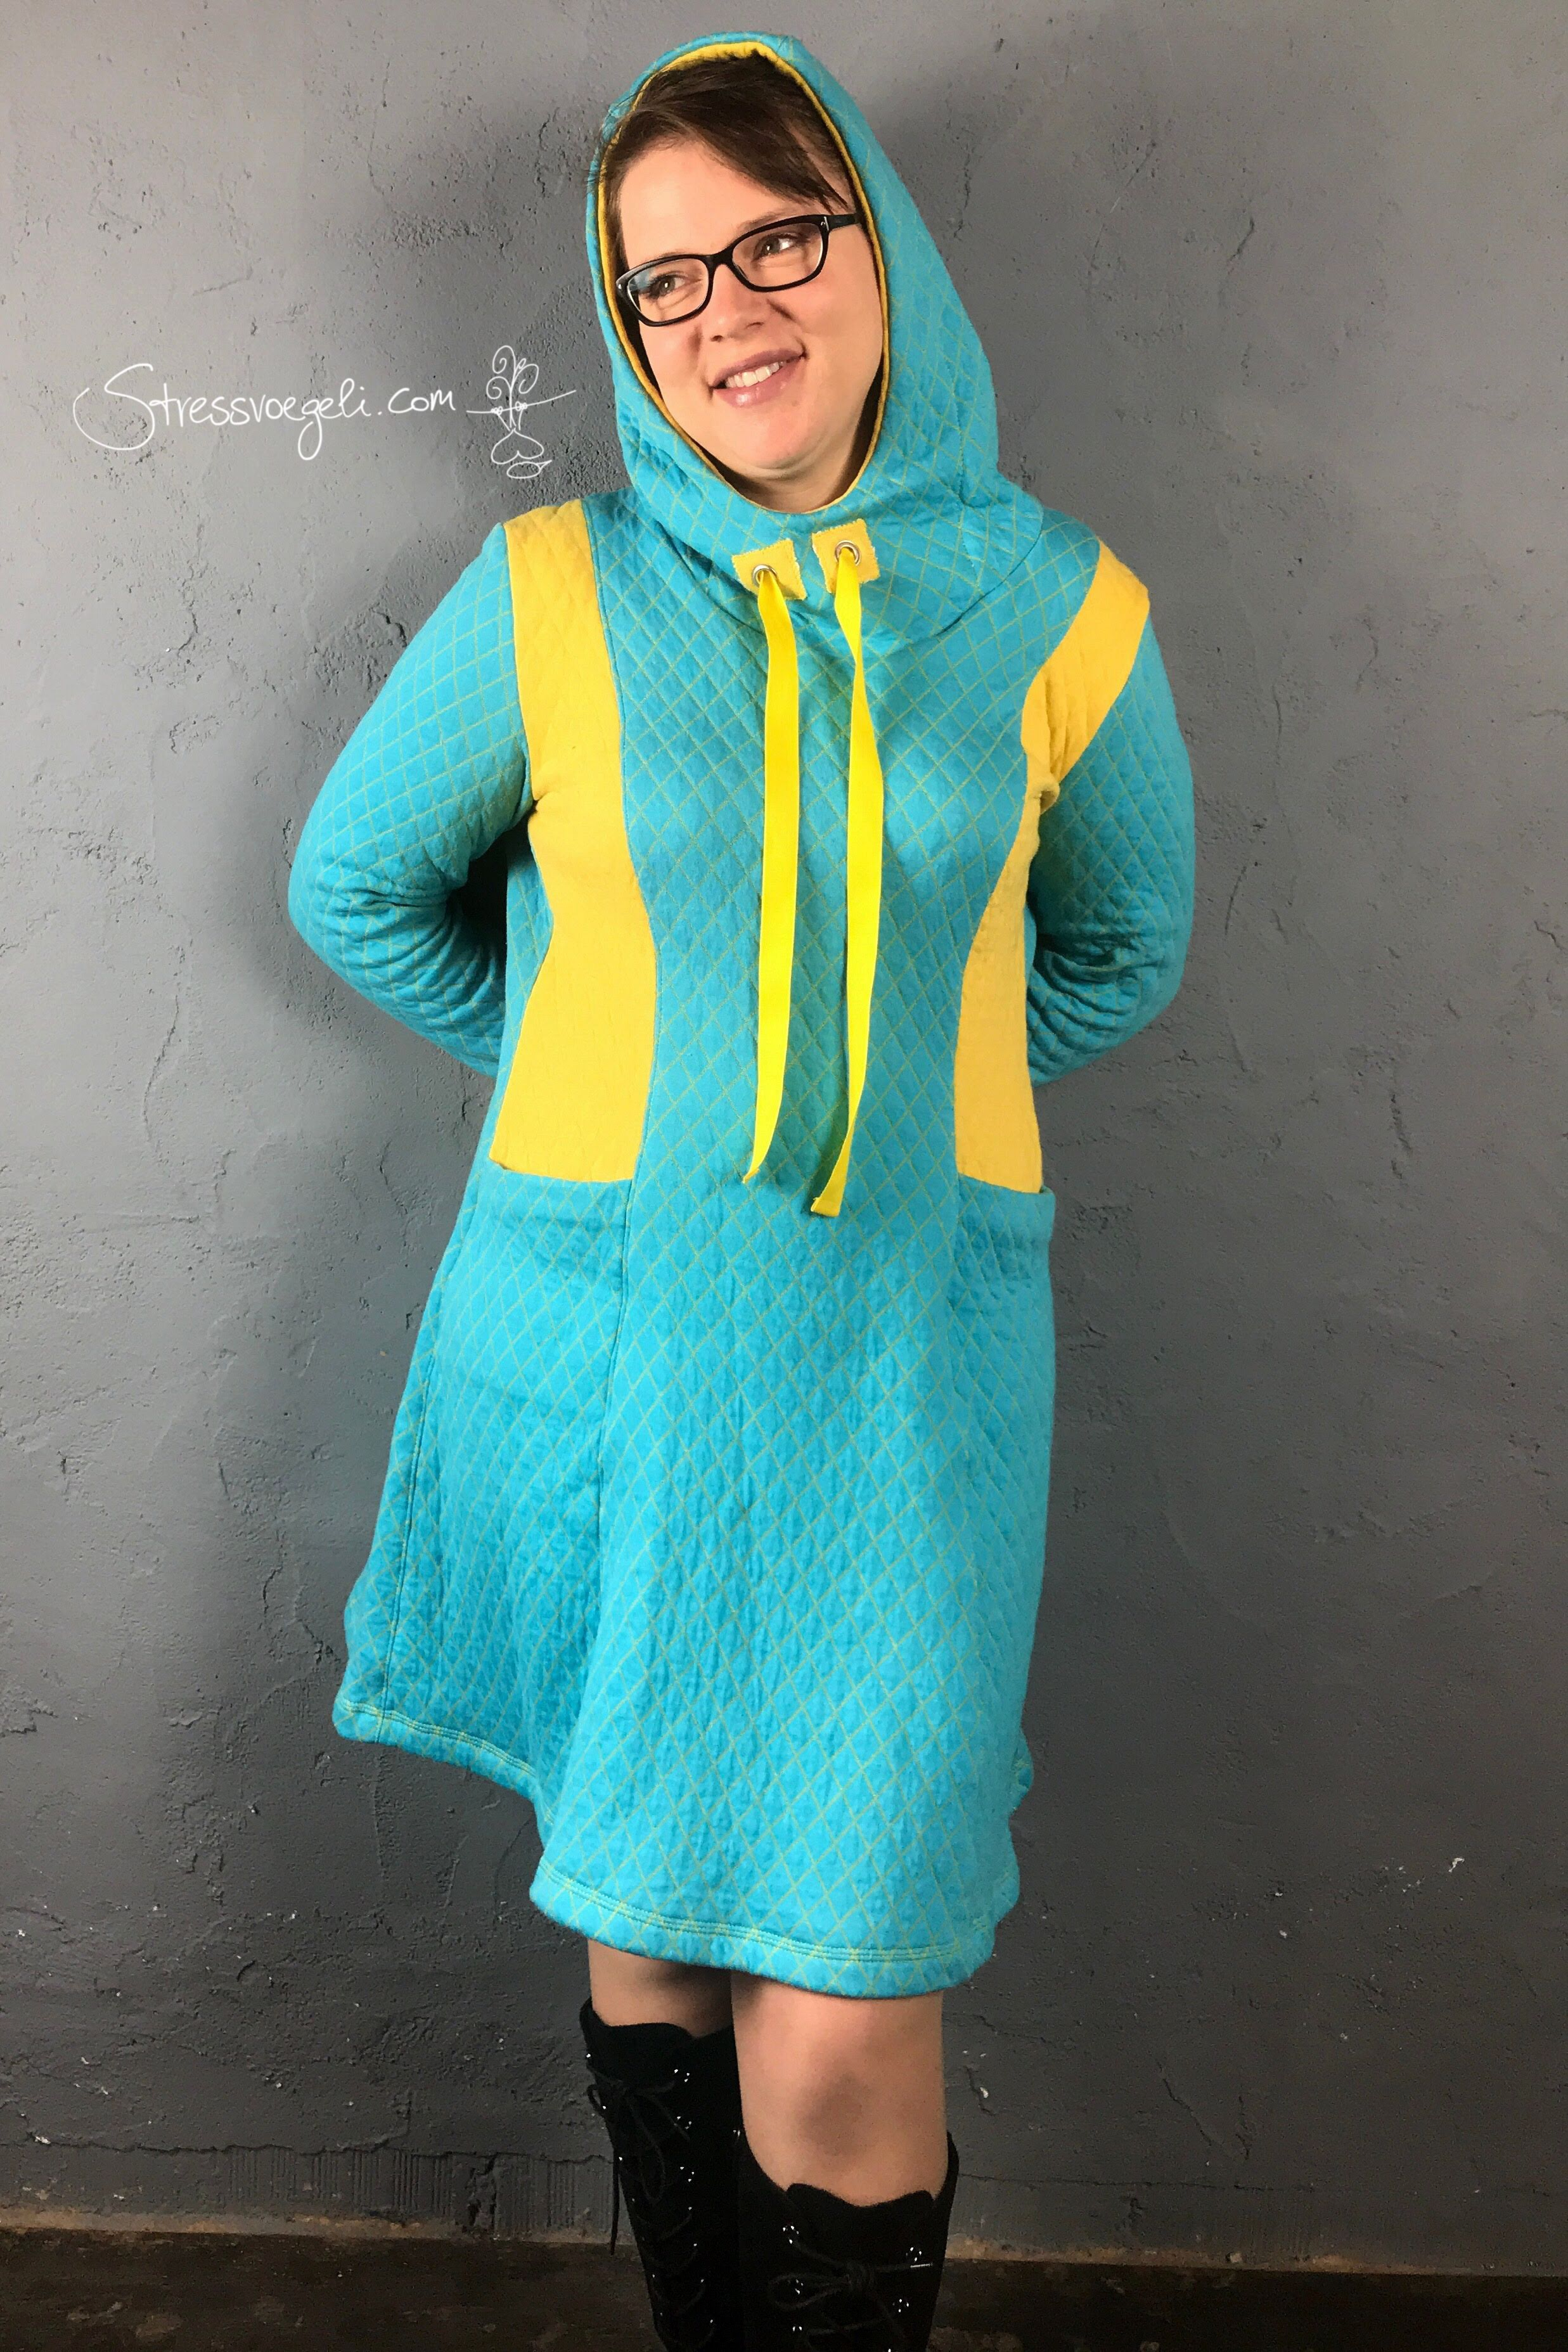 Kleid selbst genäht La Glenna Schnittgeflüster